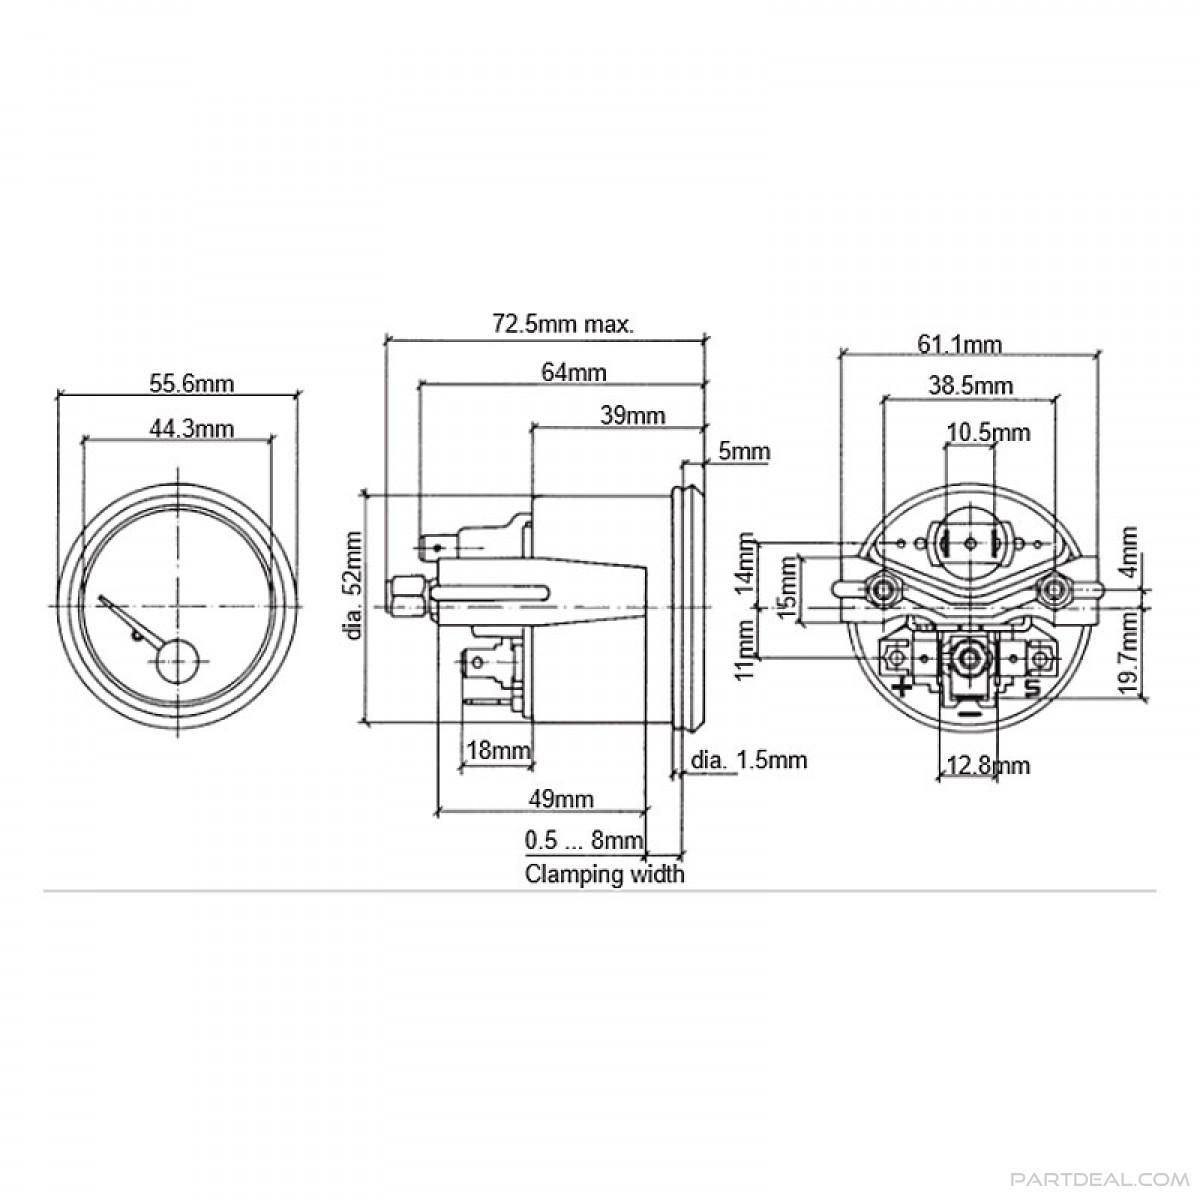 Fh 5321 Teleflex Fuel Gauge Wiring Diagram Schematic Download Diagram